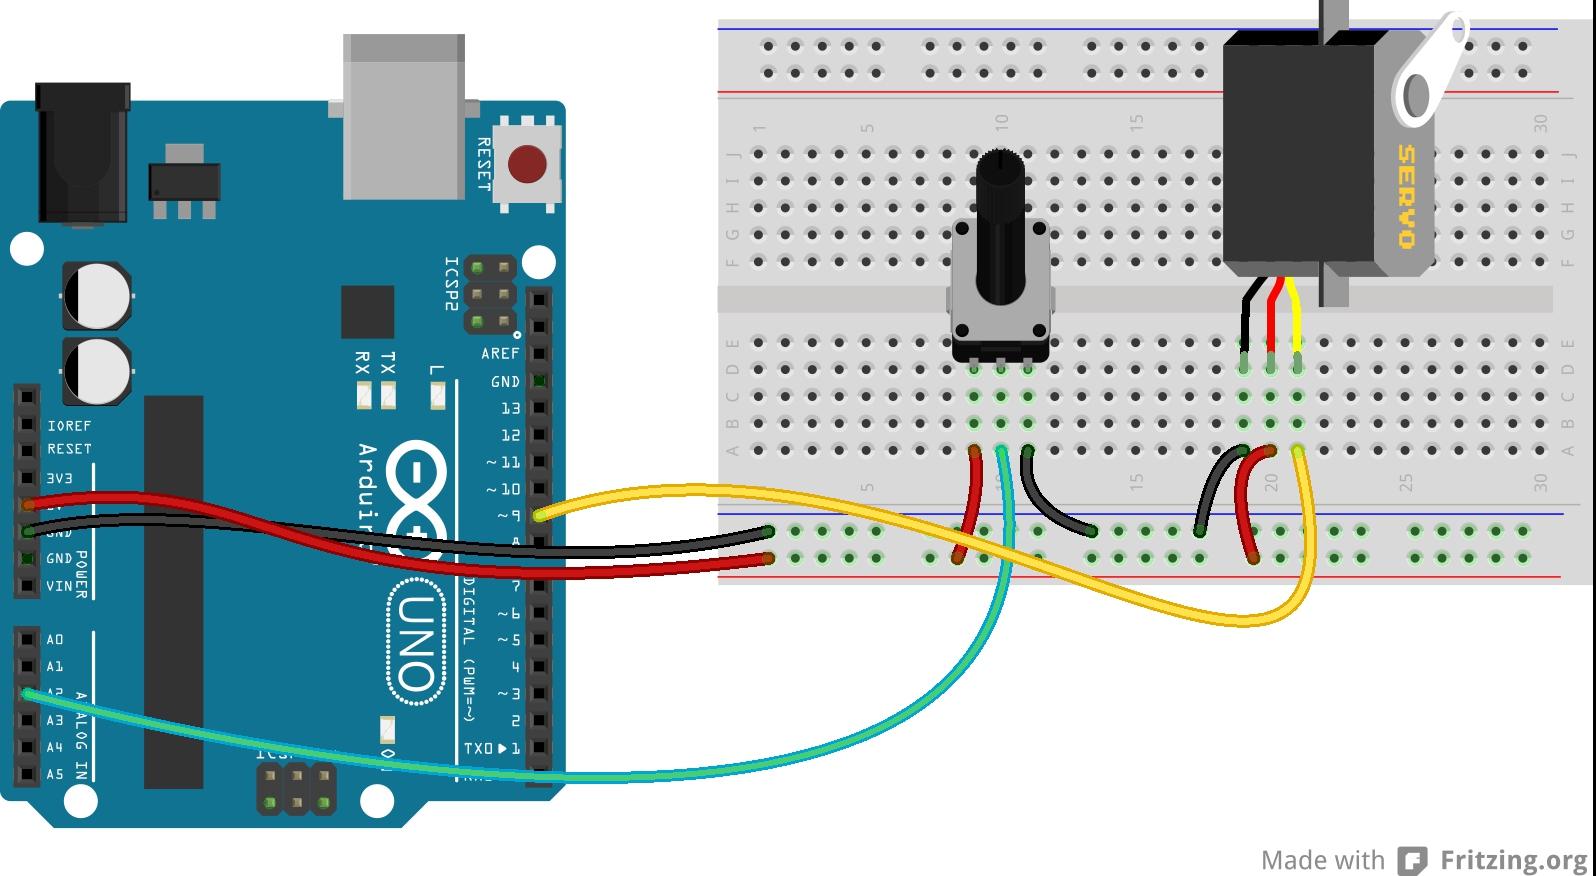 Tec Teca Ie Bxx moreover Resolver Socket Arc Acrl further X further Servopot moreover Dc Motor Basic Theory. on dc servo motor control circuit